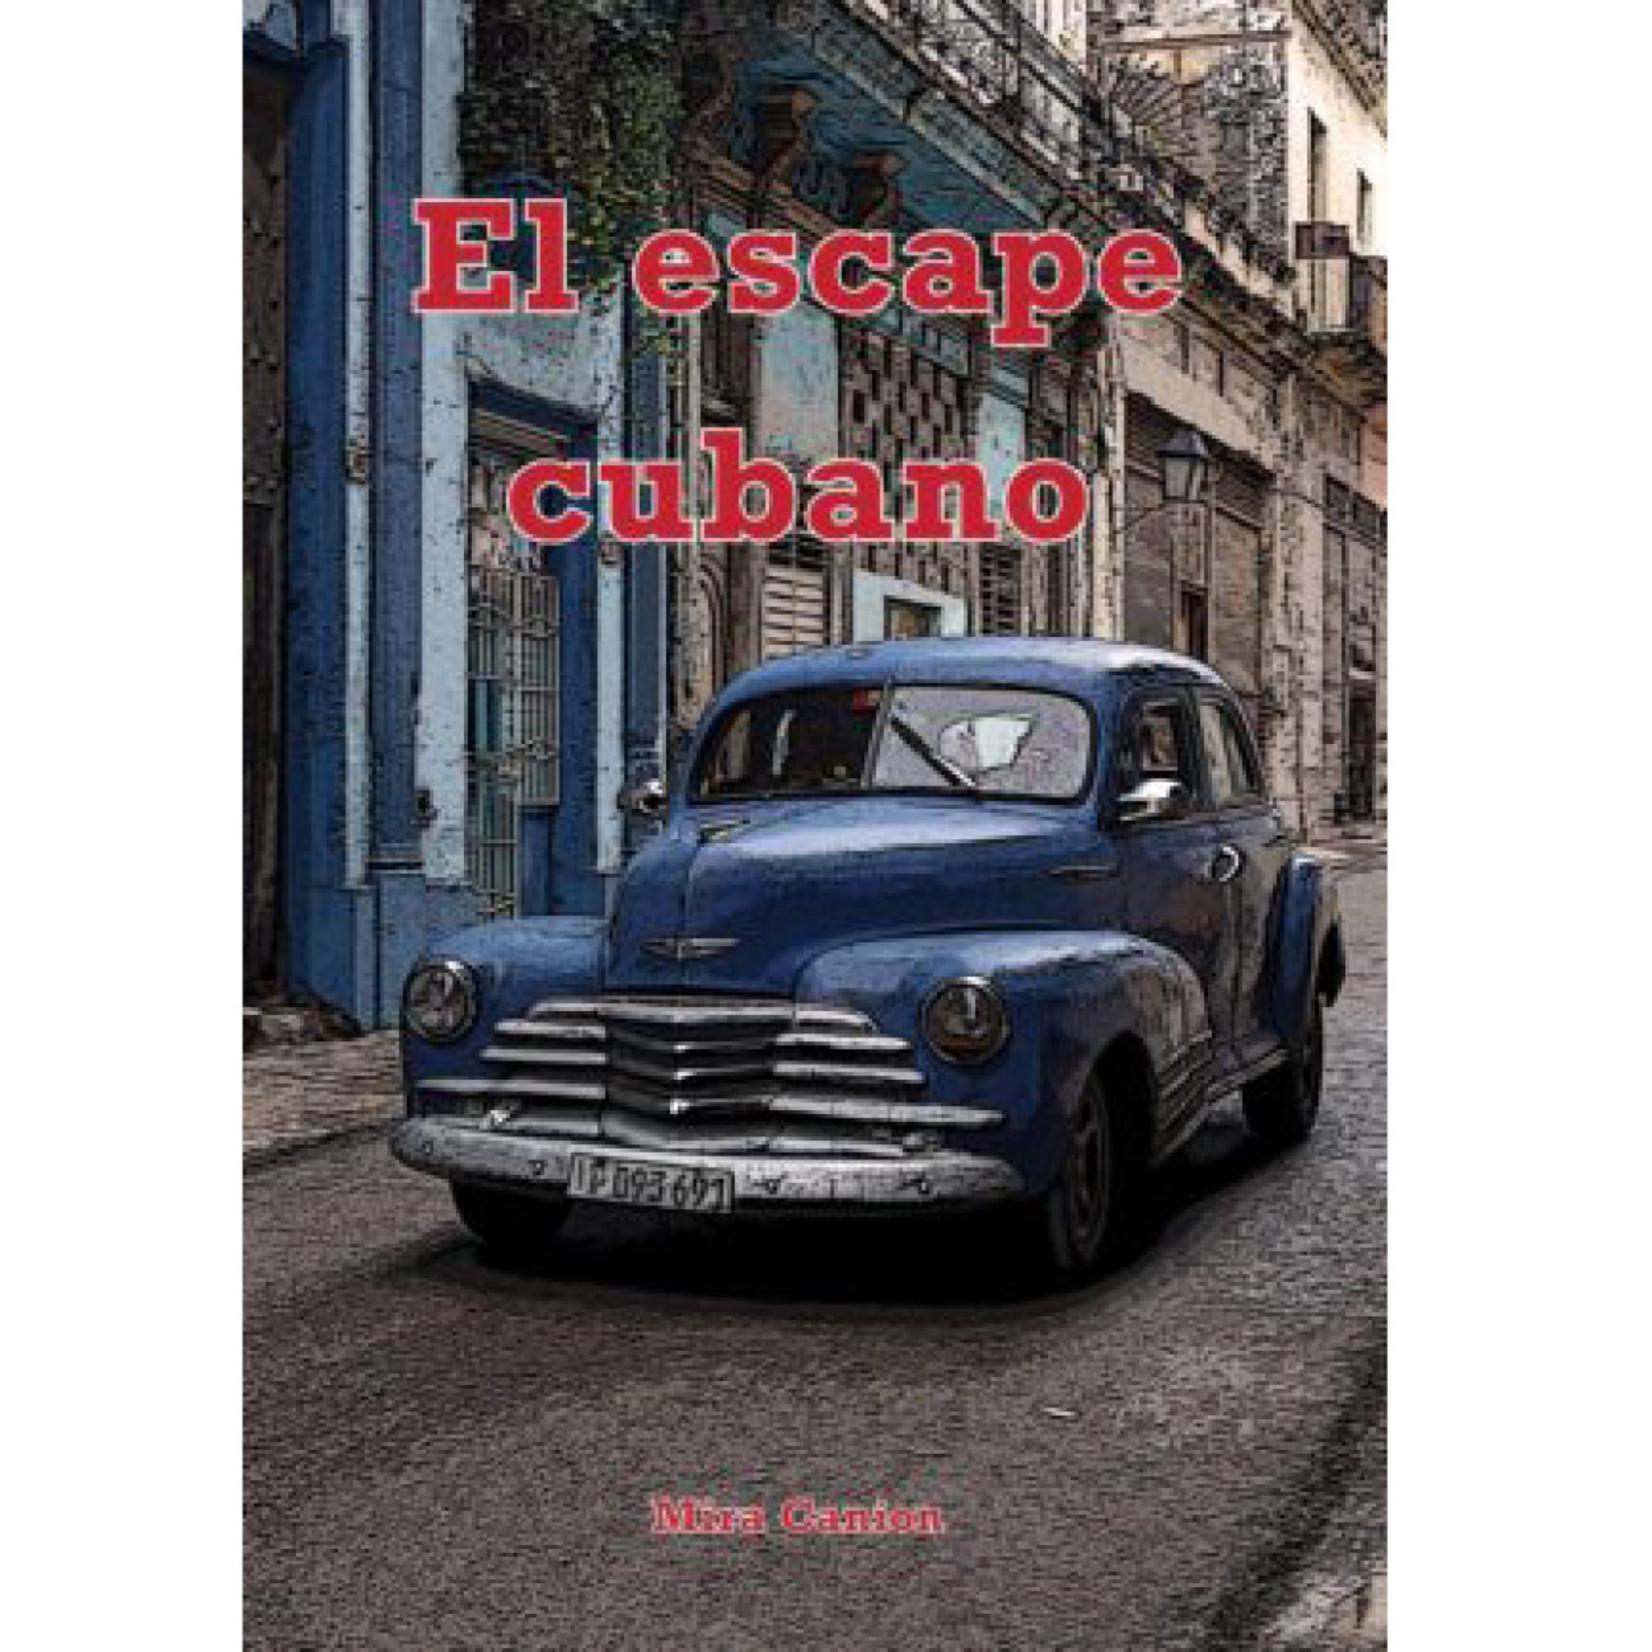 Mira Canion El escape cubano